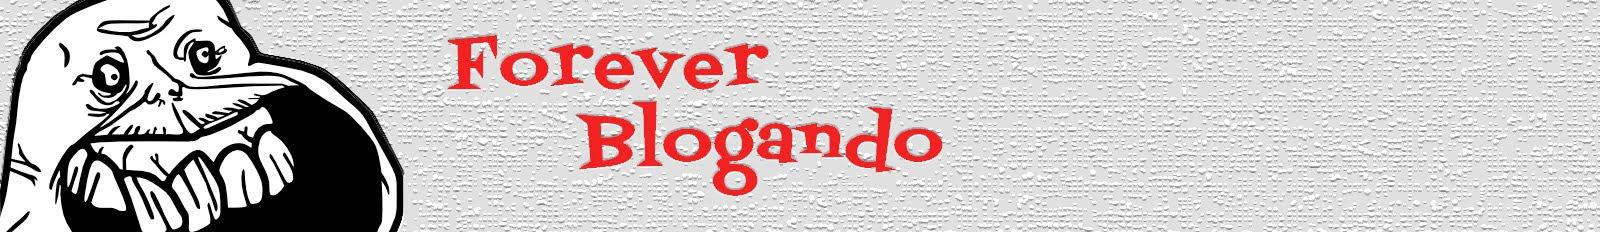 Forever Blogando